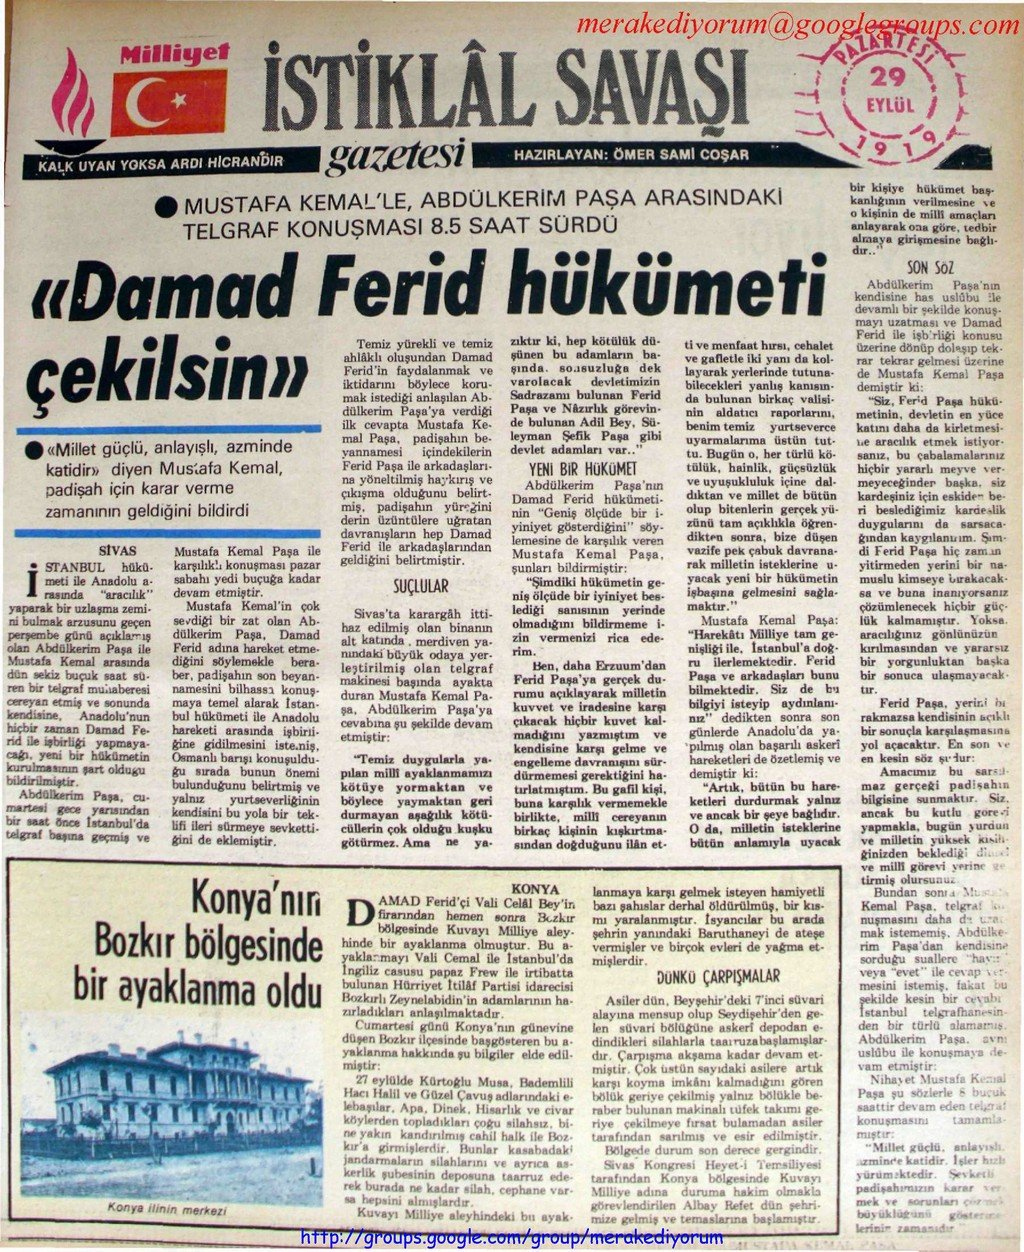 istiklal savaşı gazetesi - 29 eylül 1919